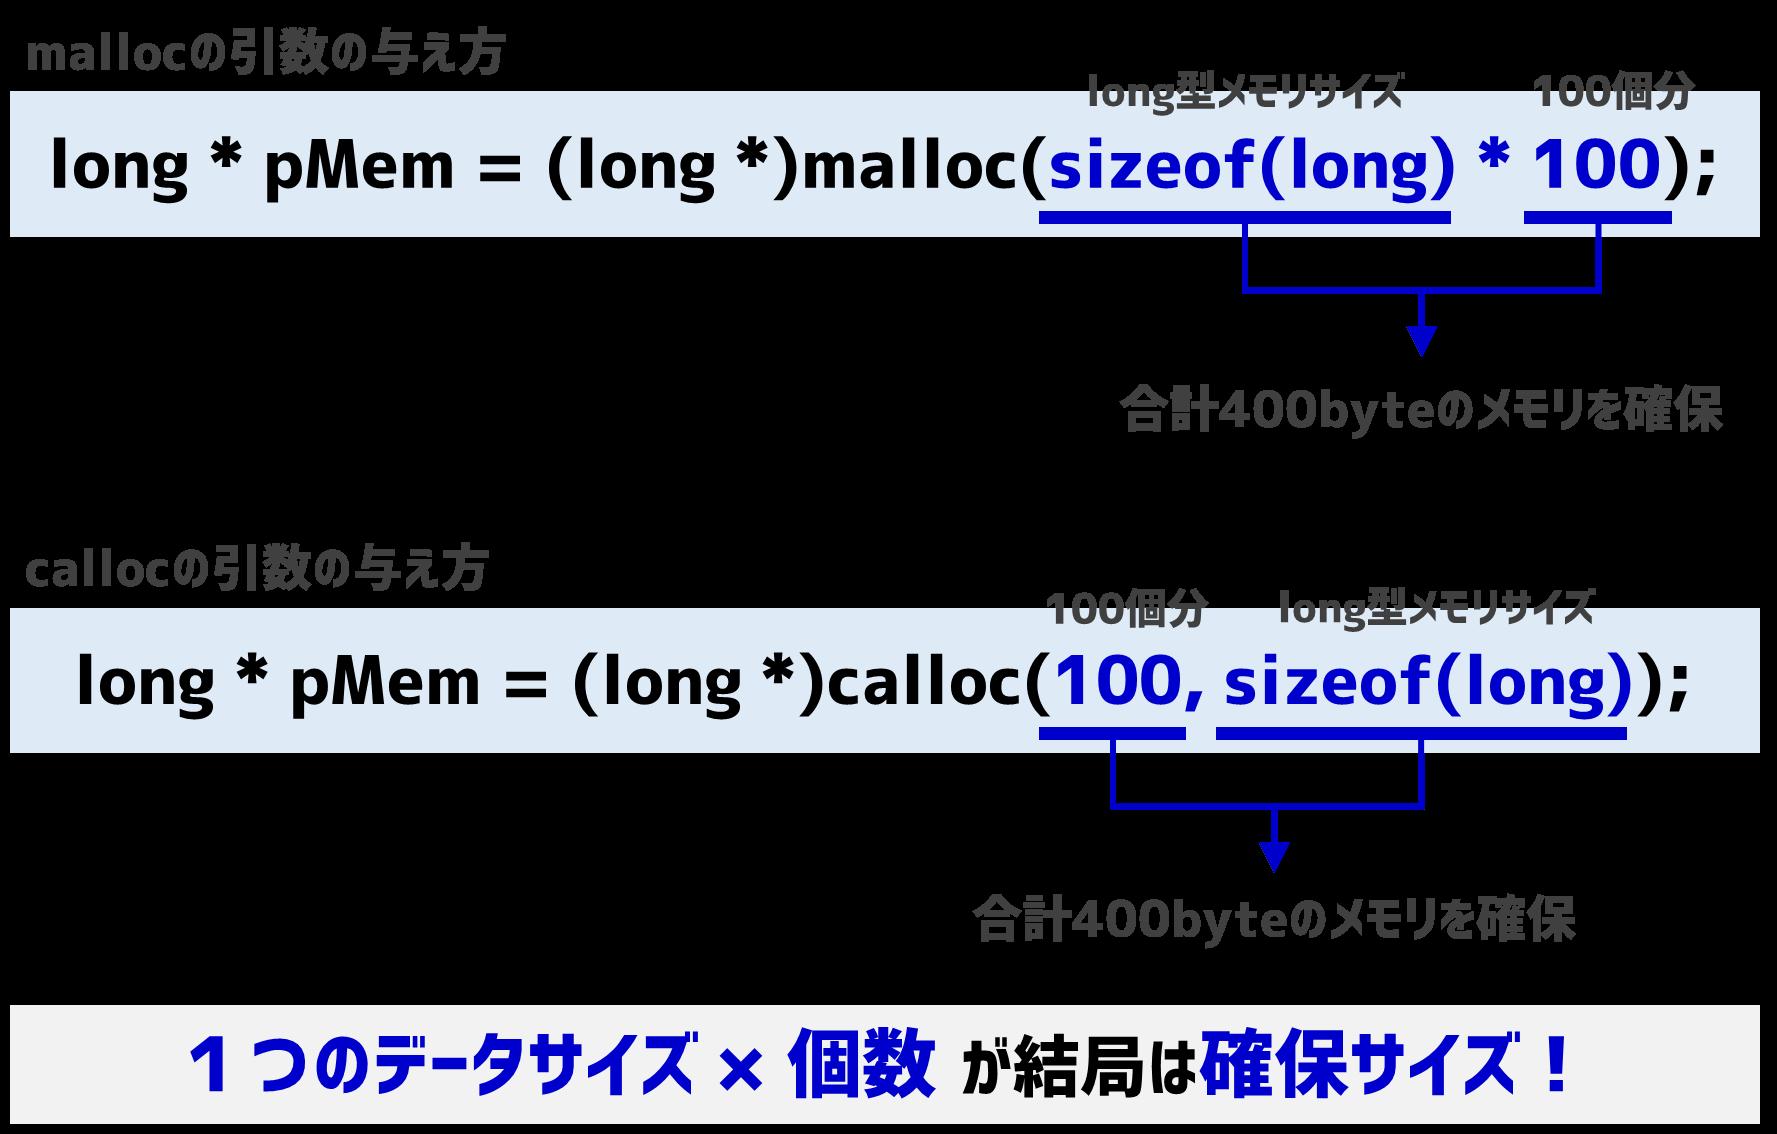 callocとmallocの引数の違い